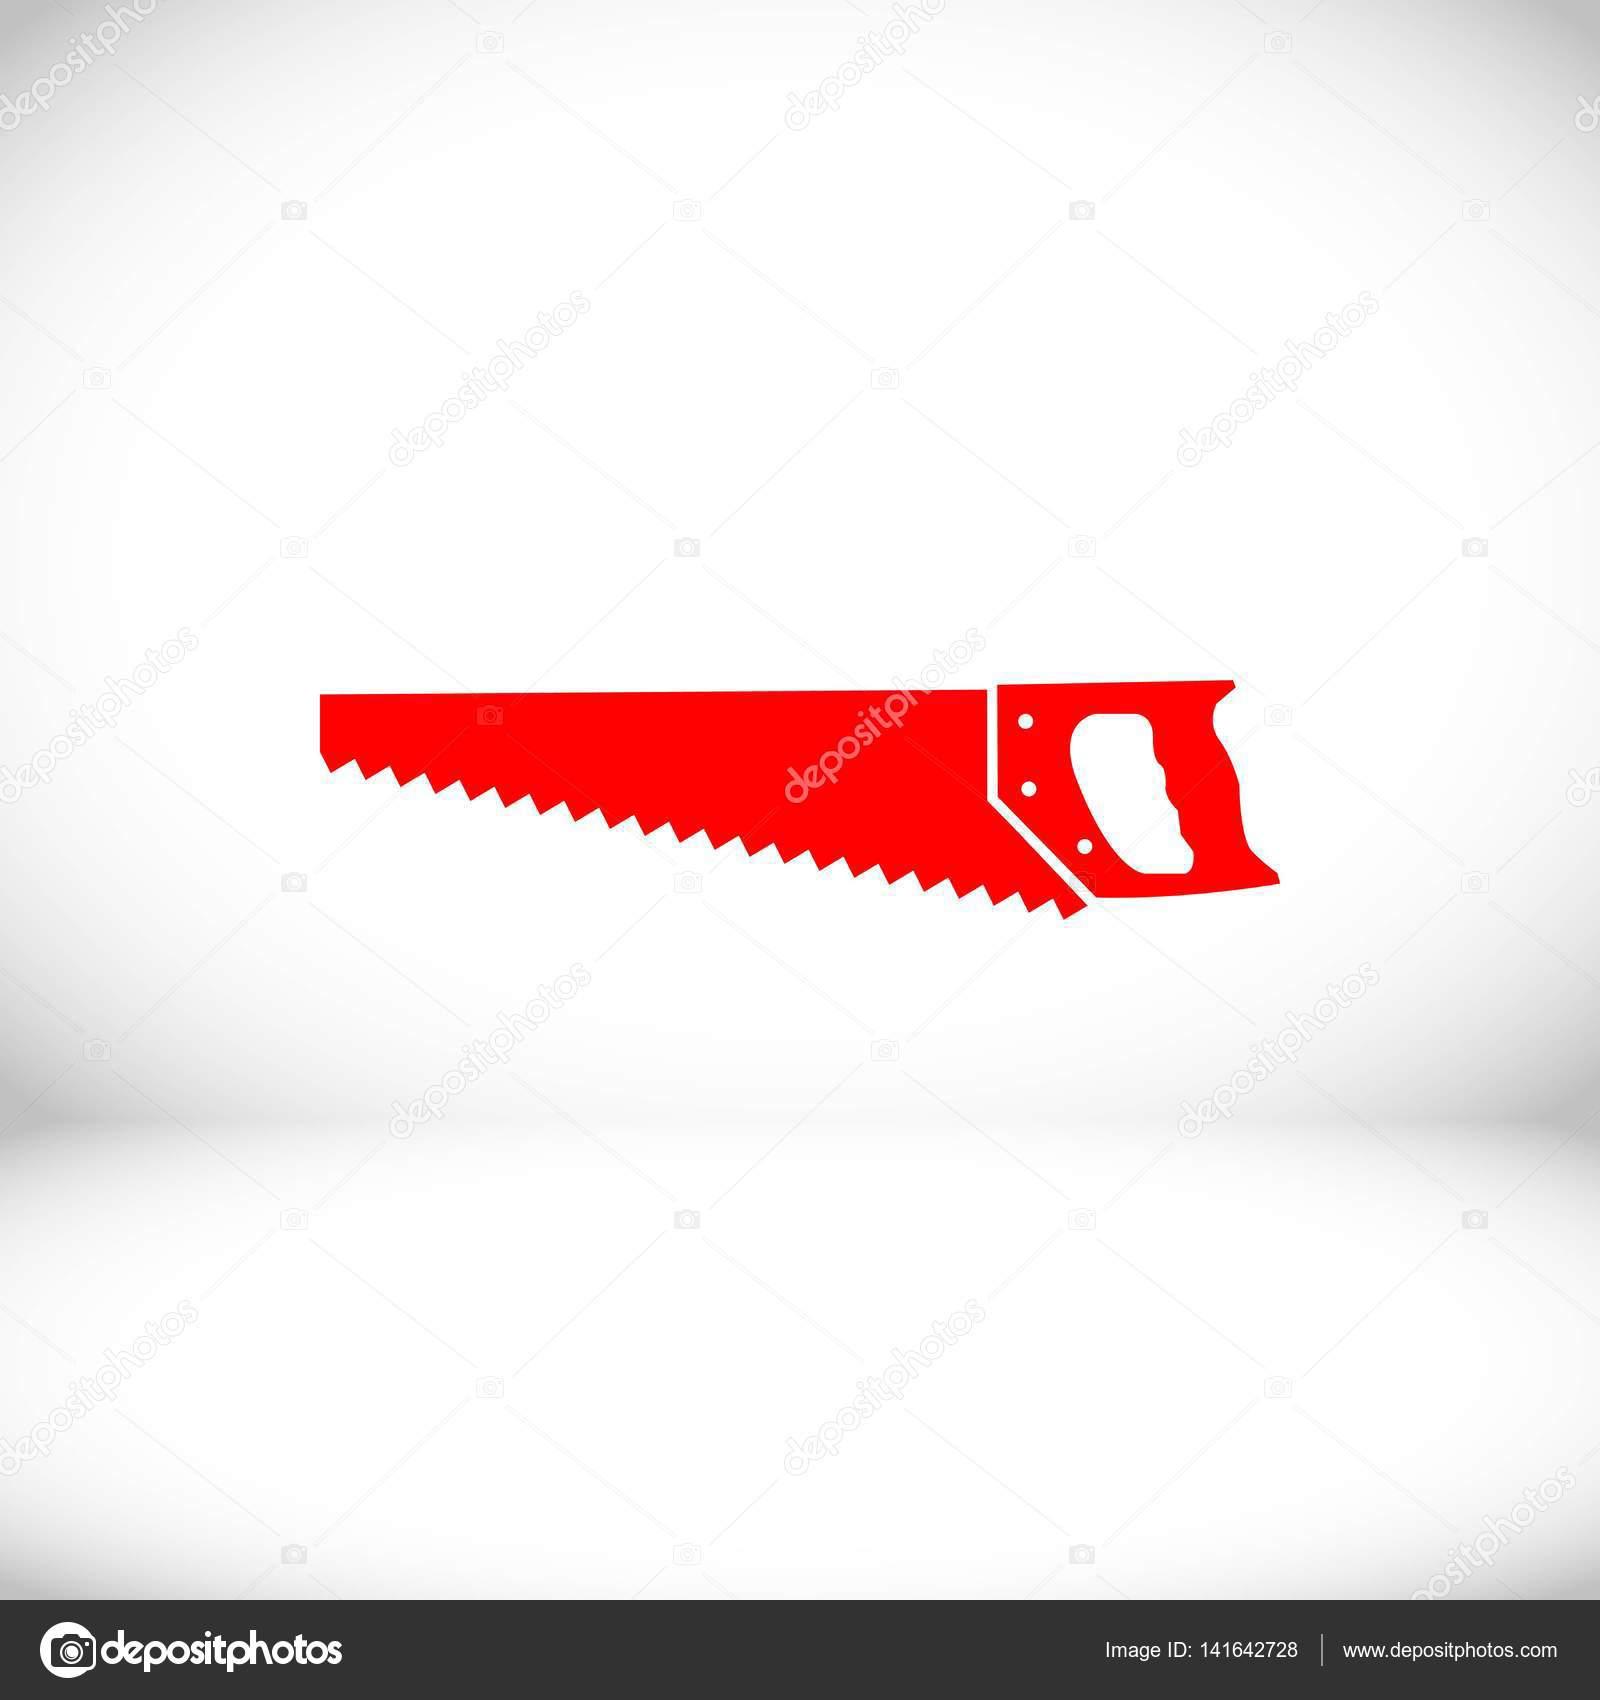 Depositphotos 141642728 stock illustration hacksaw icon stock vector illustration